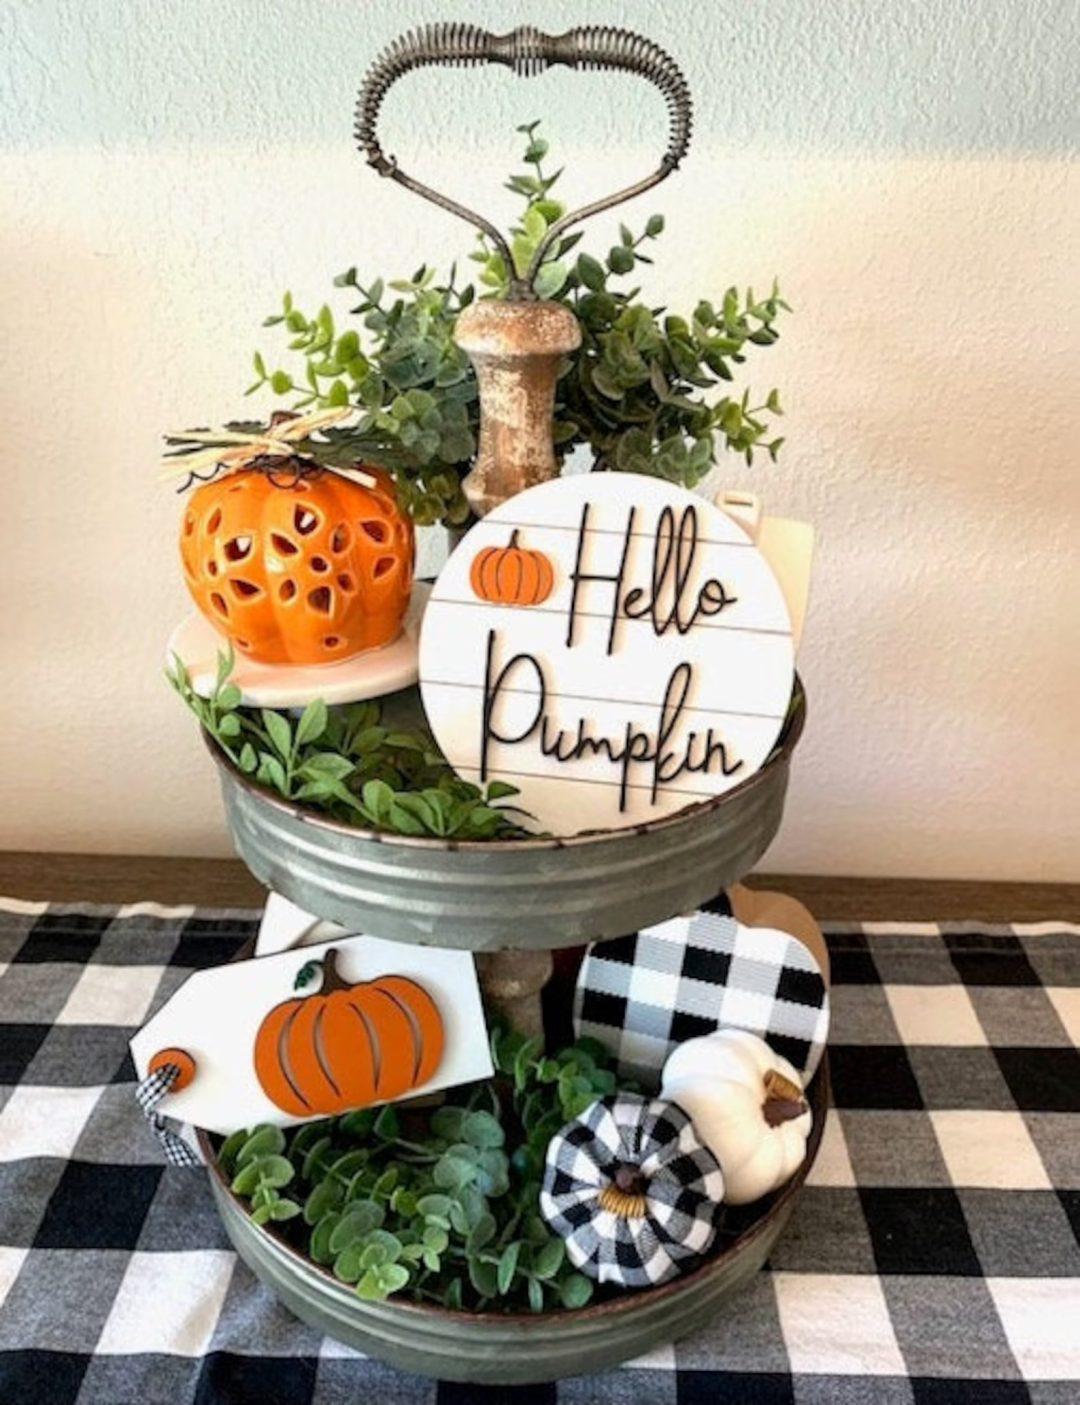 Hello Pumpkin Decor Tray